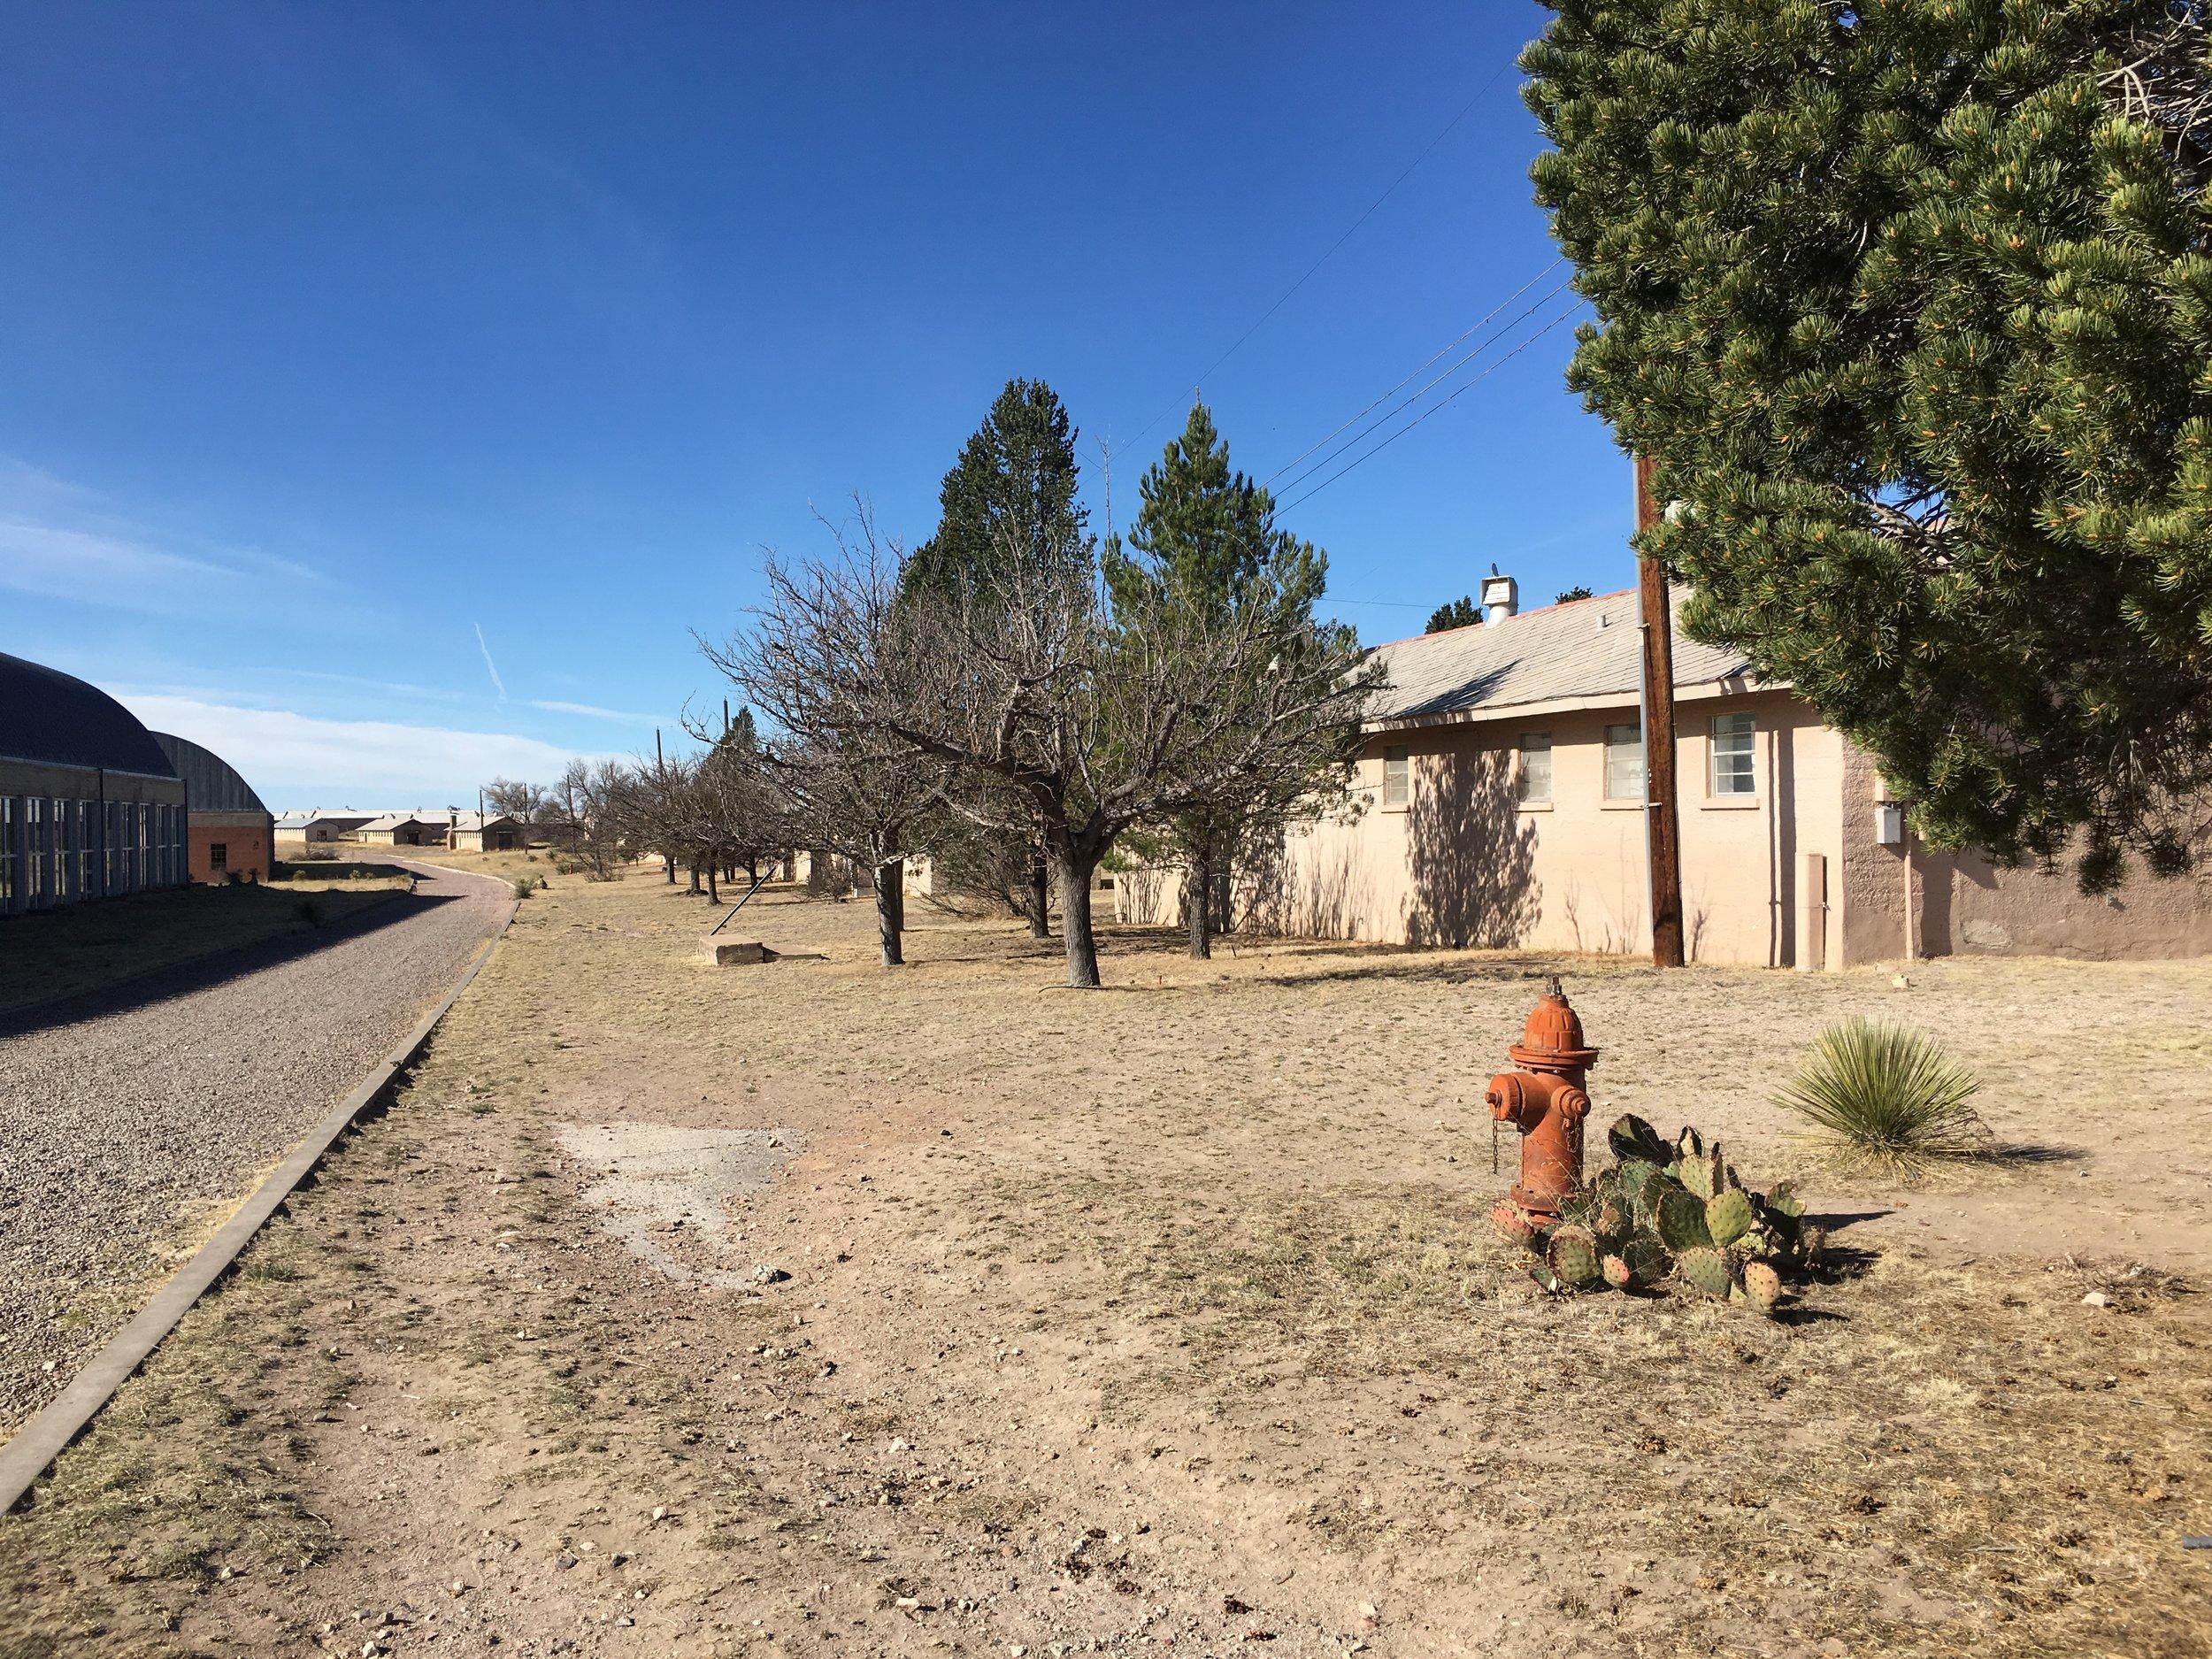 Chinati Foundation grounds, Marfa, Texas